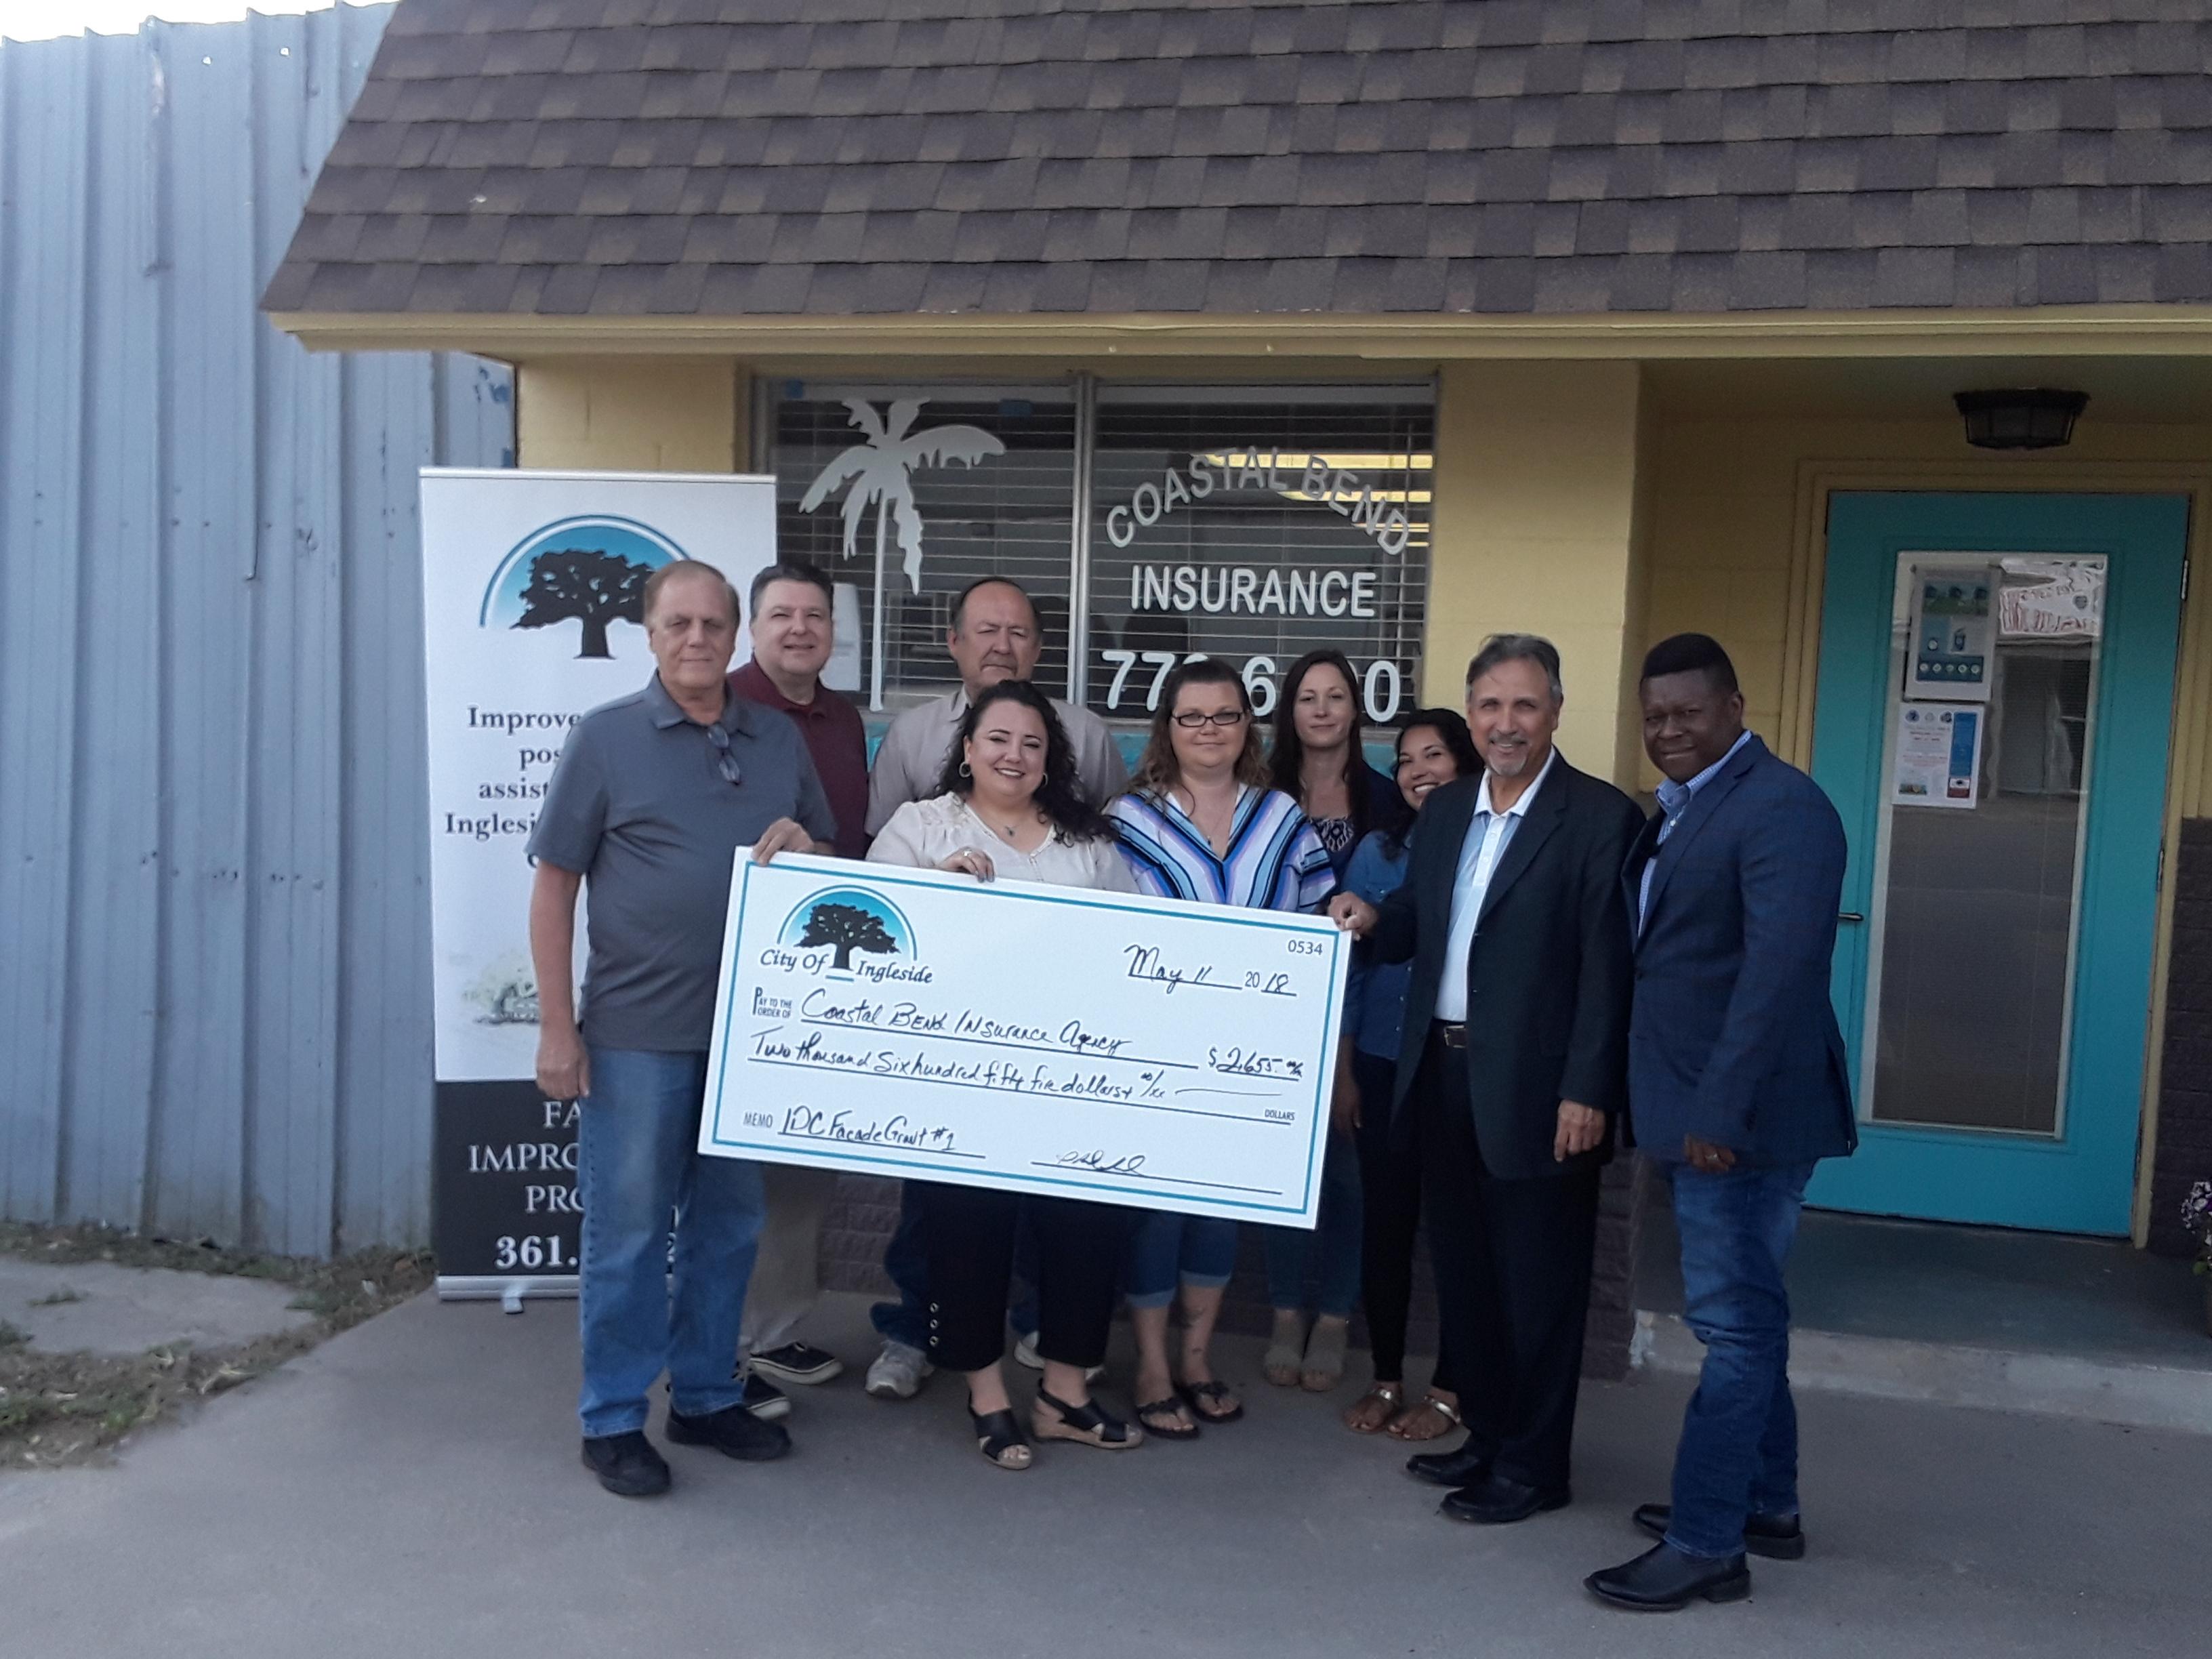 Coastal Bend Insurance receives grant